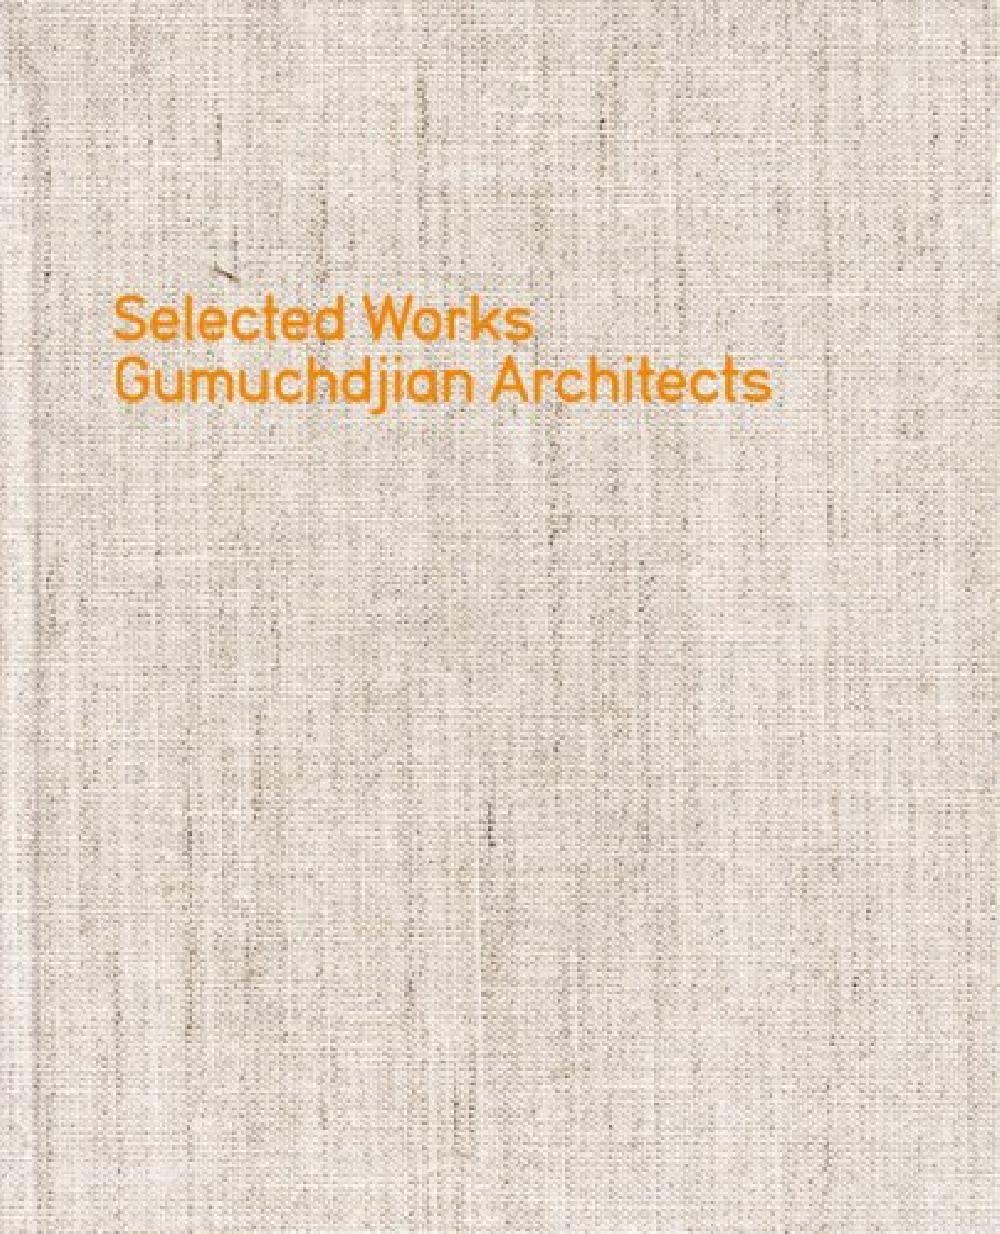 Gumuchdjian Architects